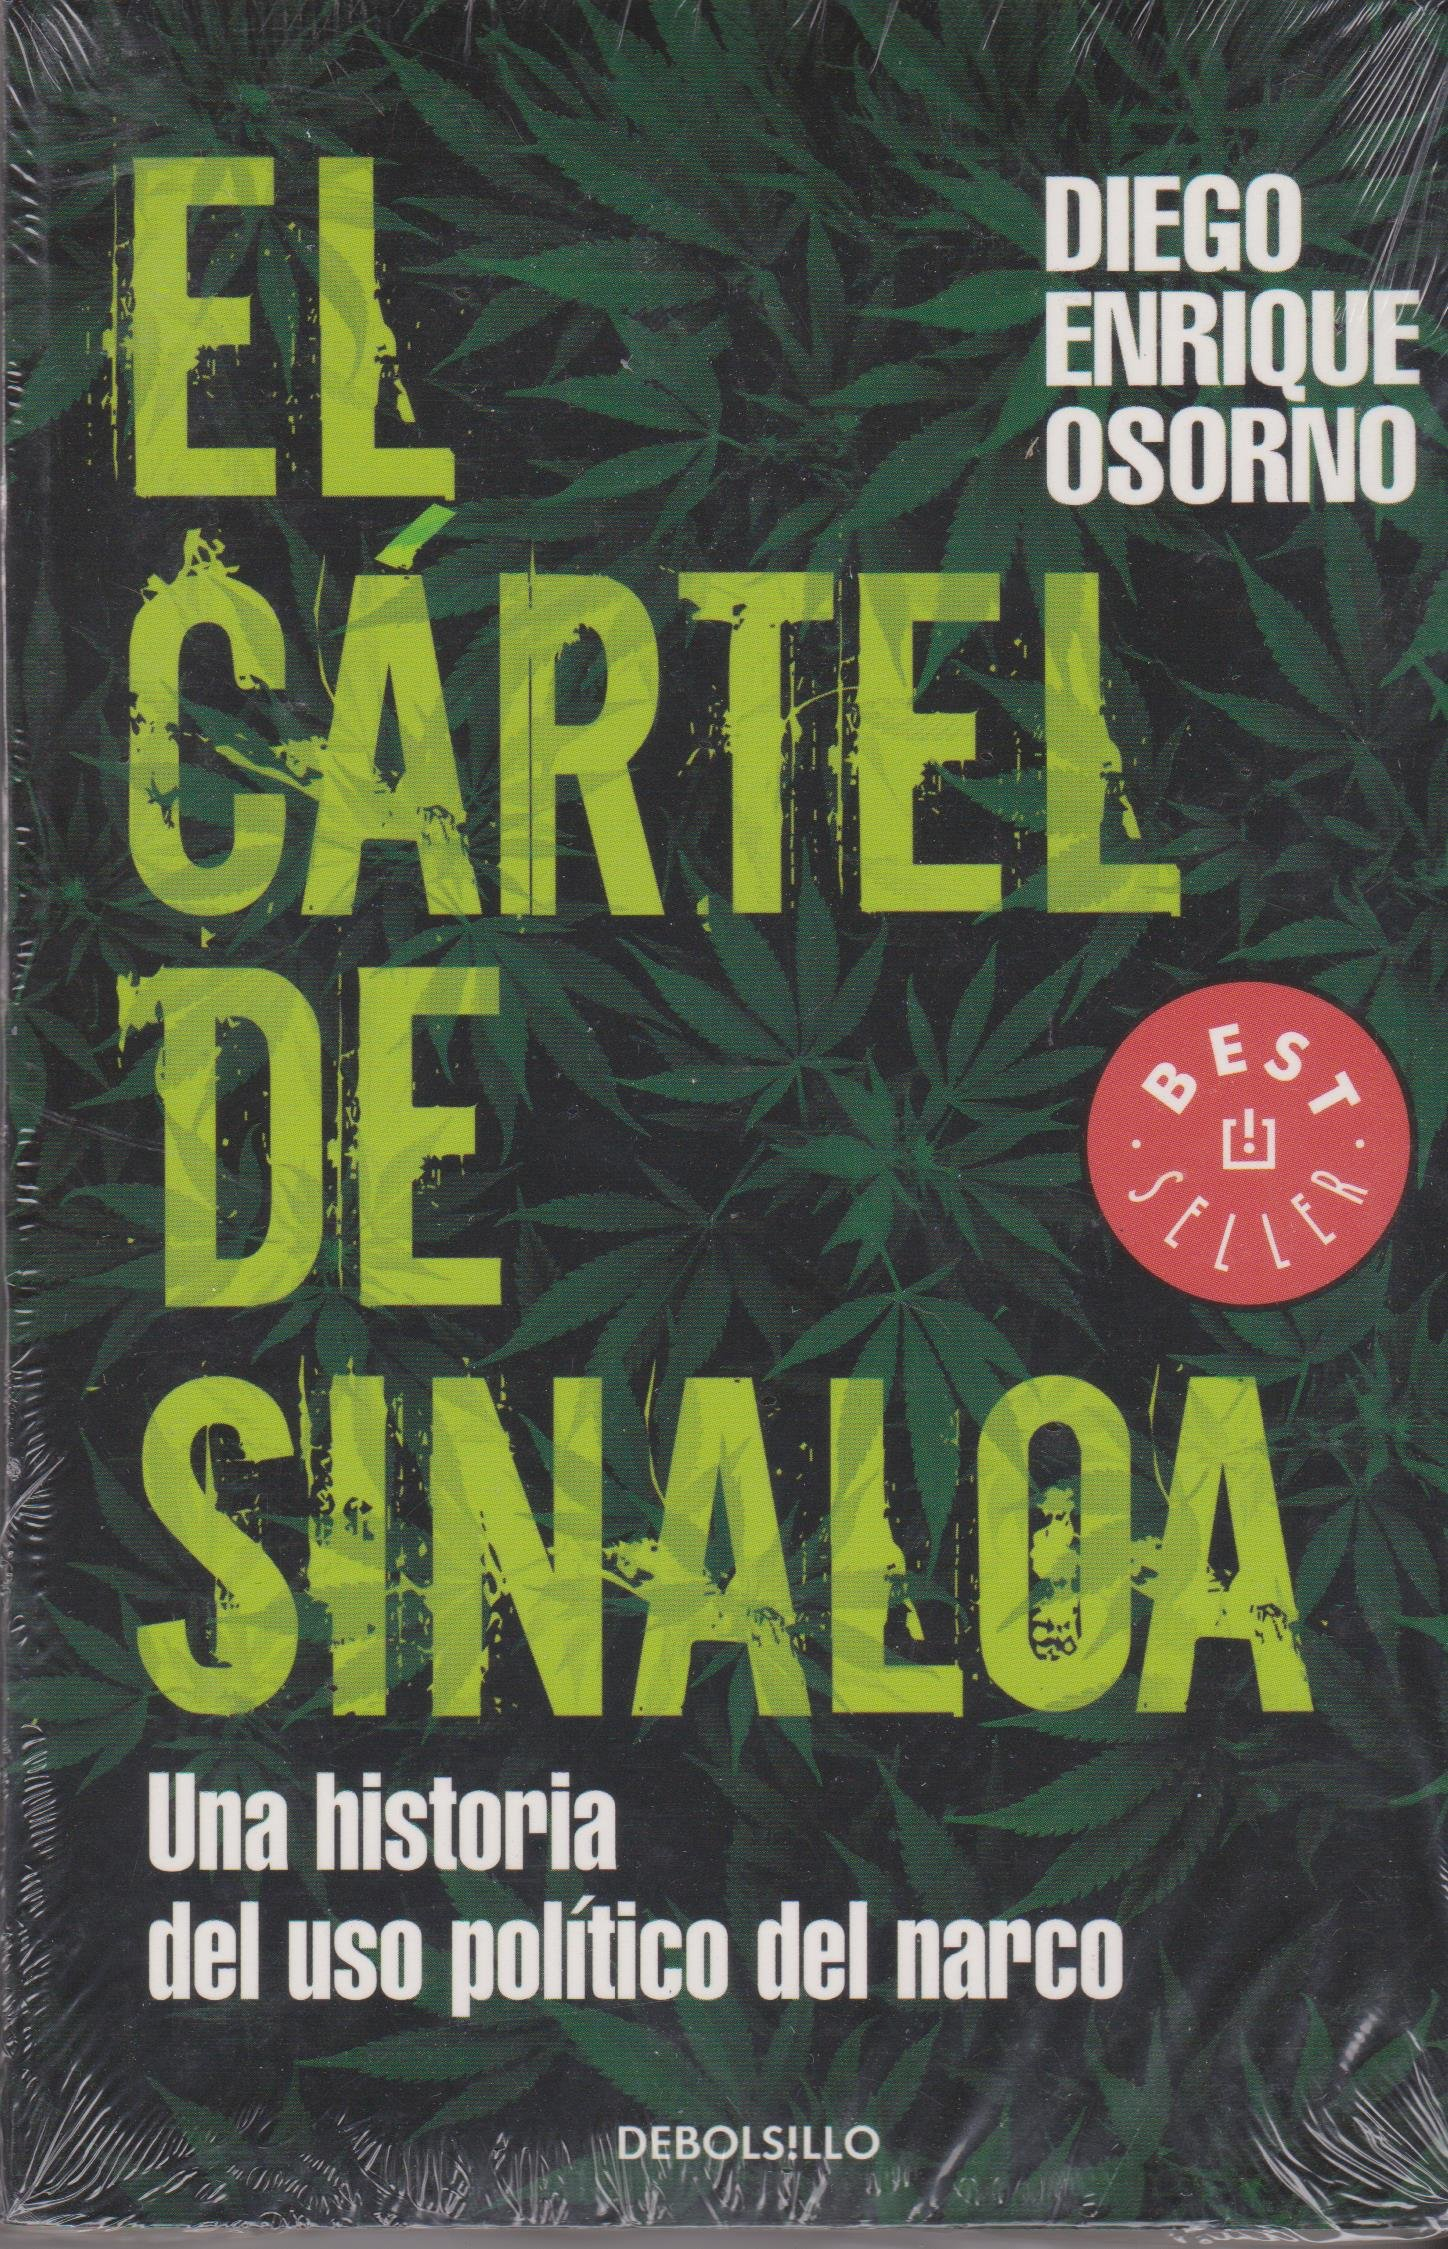 Cártel de sinaloa, El: Varios: 9786073103541: Amazon.com: Books